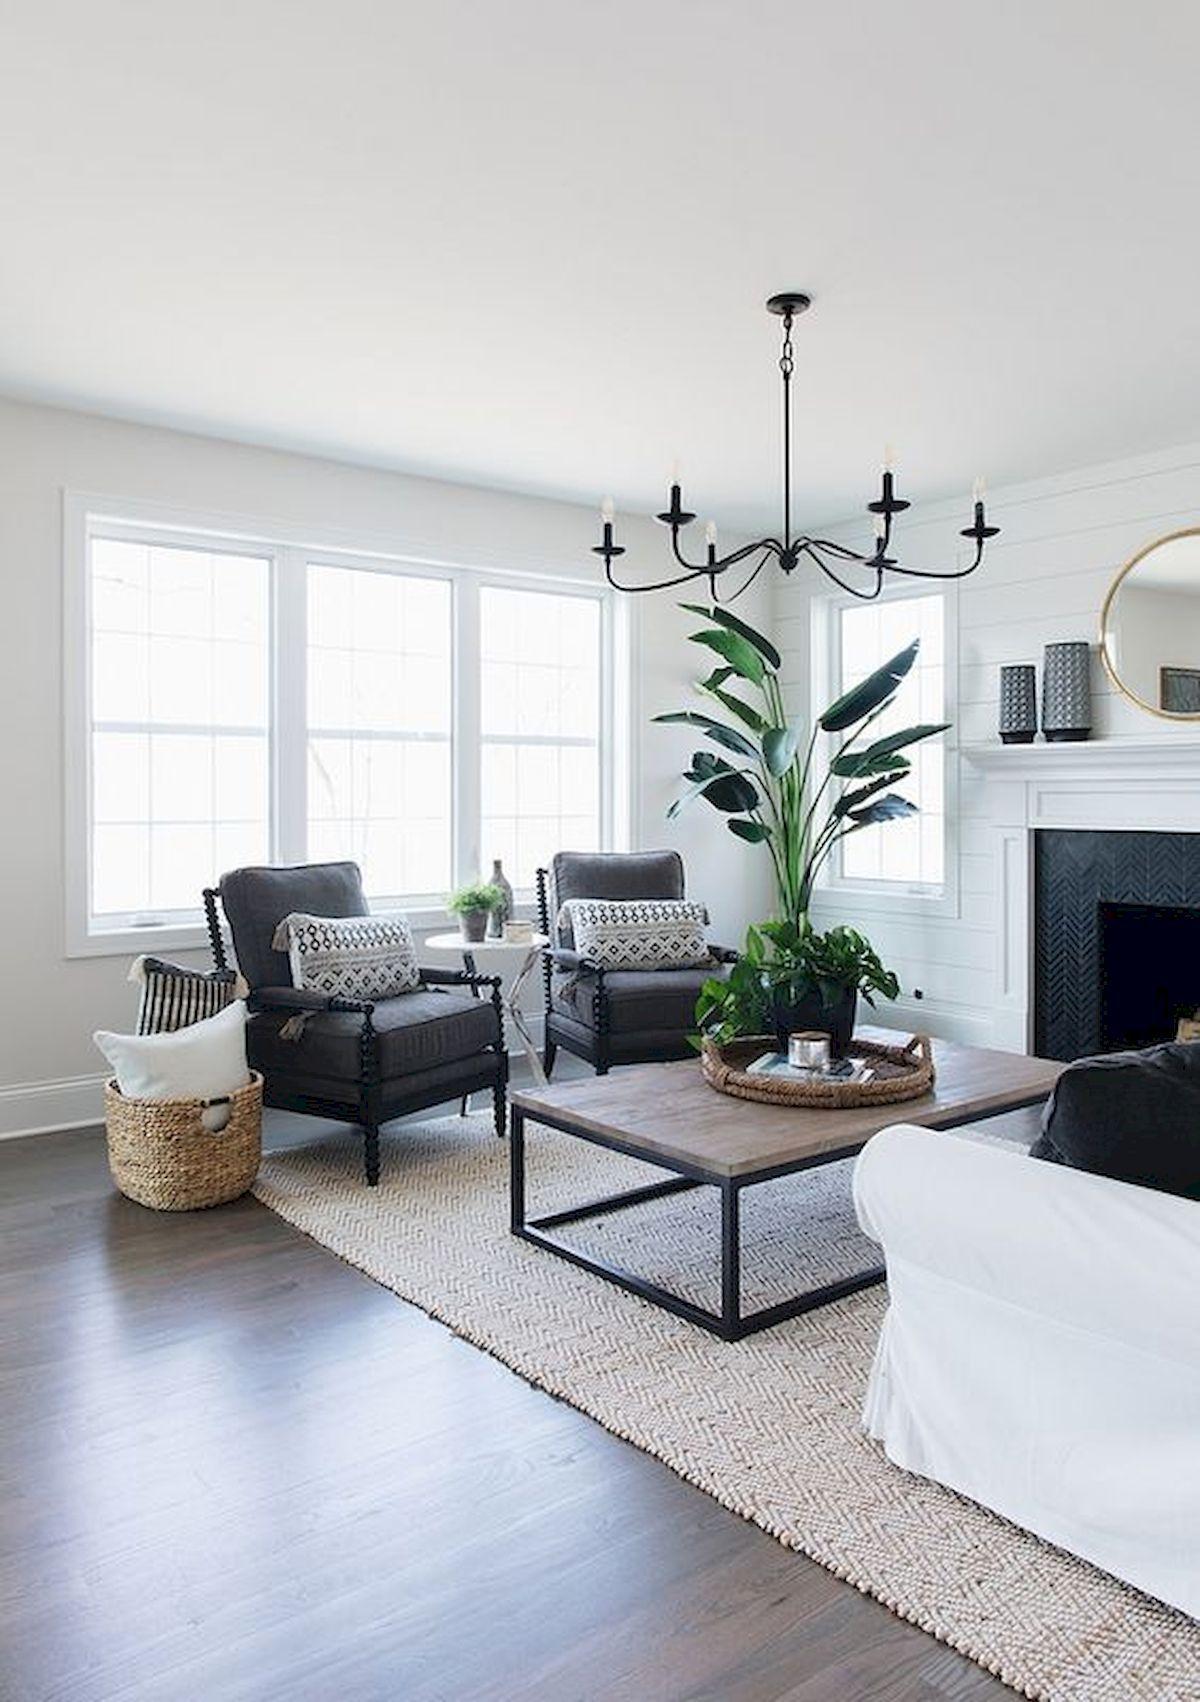 33 Awesome Farmhouse Small Apartment Decor Ideas And Design #modernfarmhouselivingroom